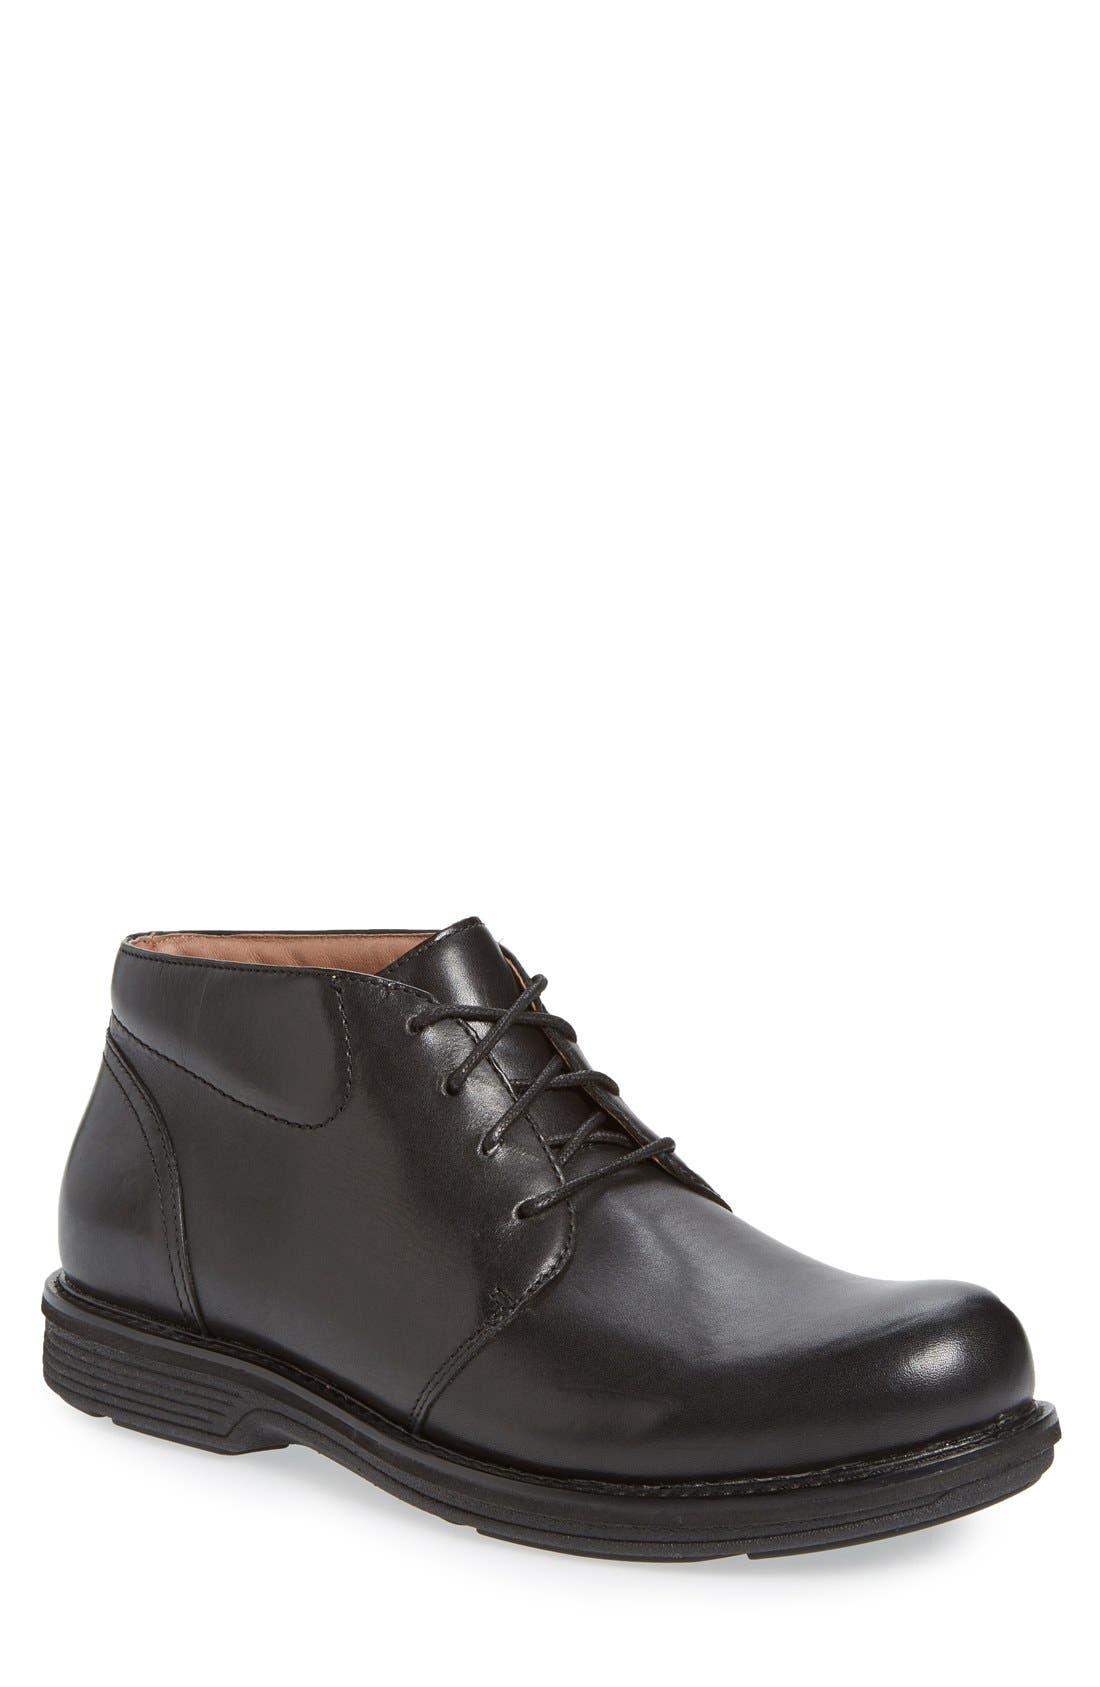 Alternate Image 1 Selected - Dansko 'Jake' Chukka Boot (Men)